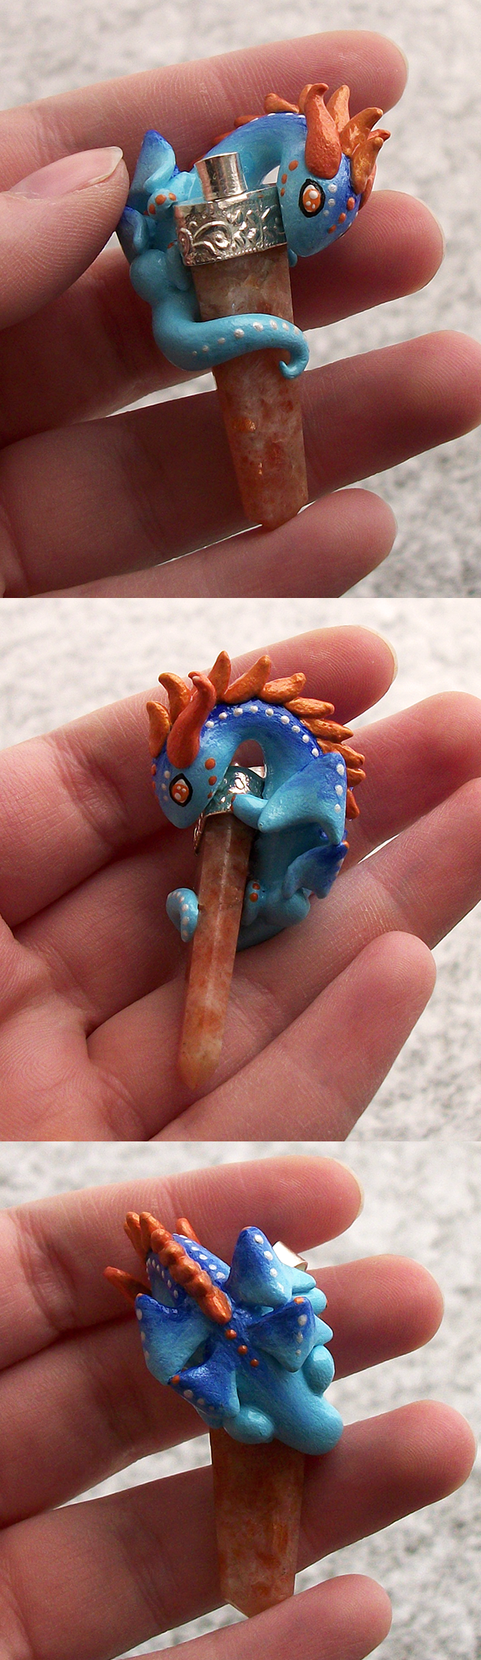 Sunstone Dragon Pendant by KingMelissa